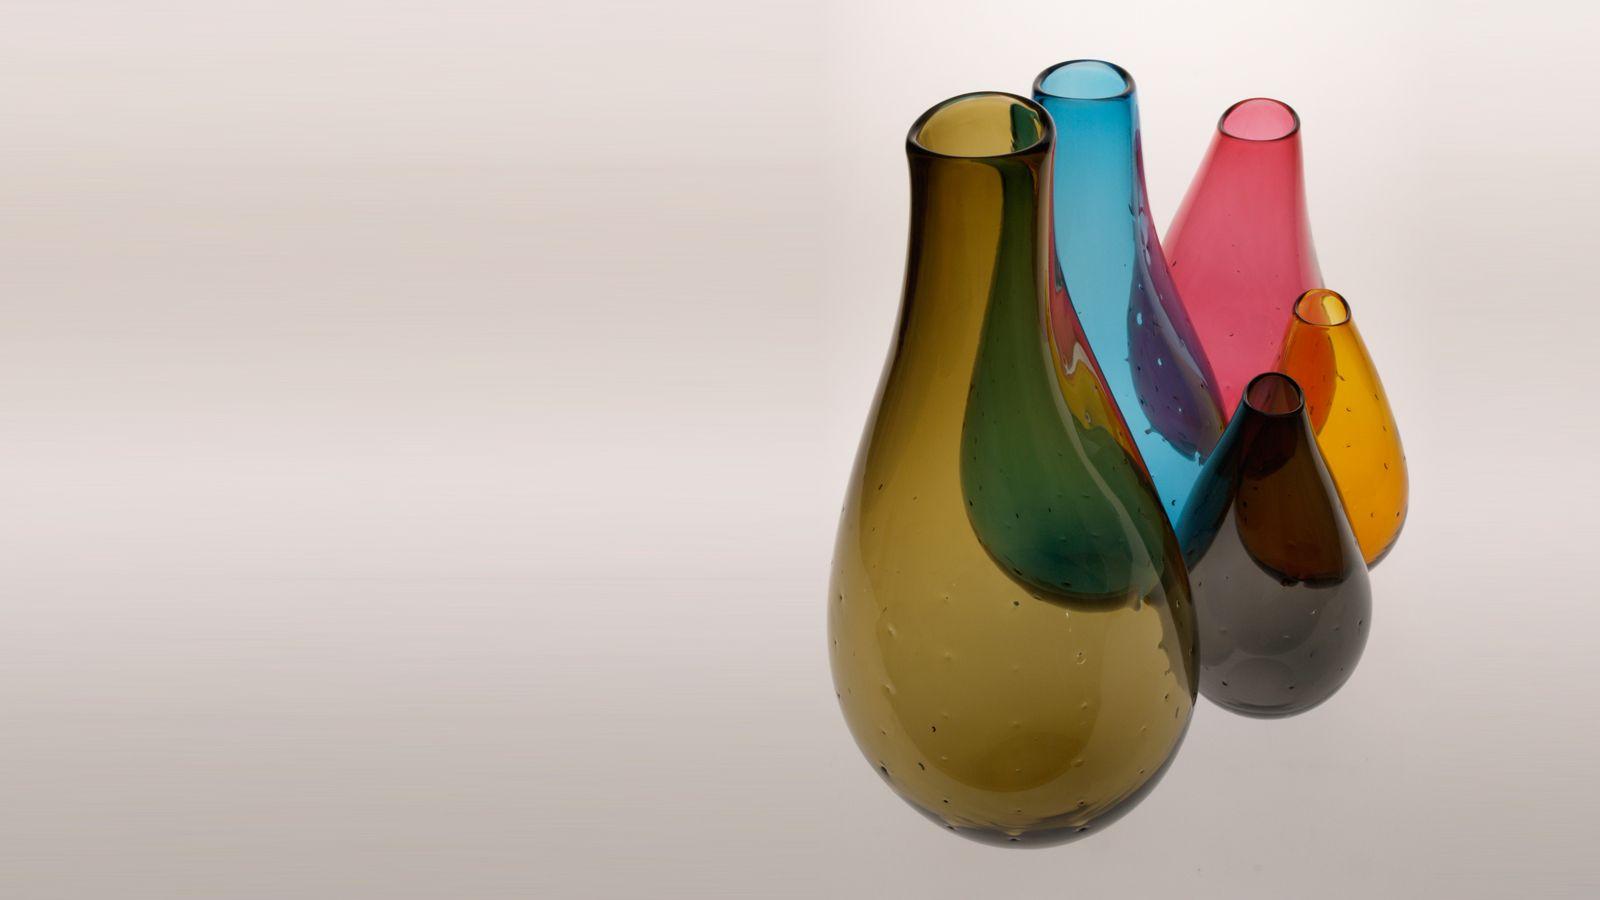 Stewart Hearn Hand Blown Glass Pollen Vases - Petite, Small, Medium & Large